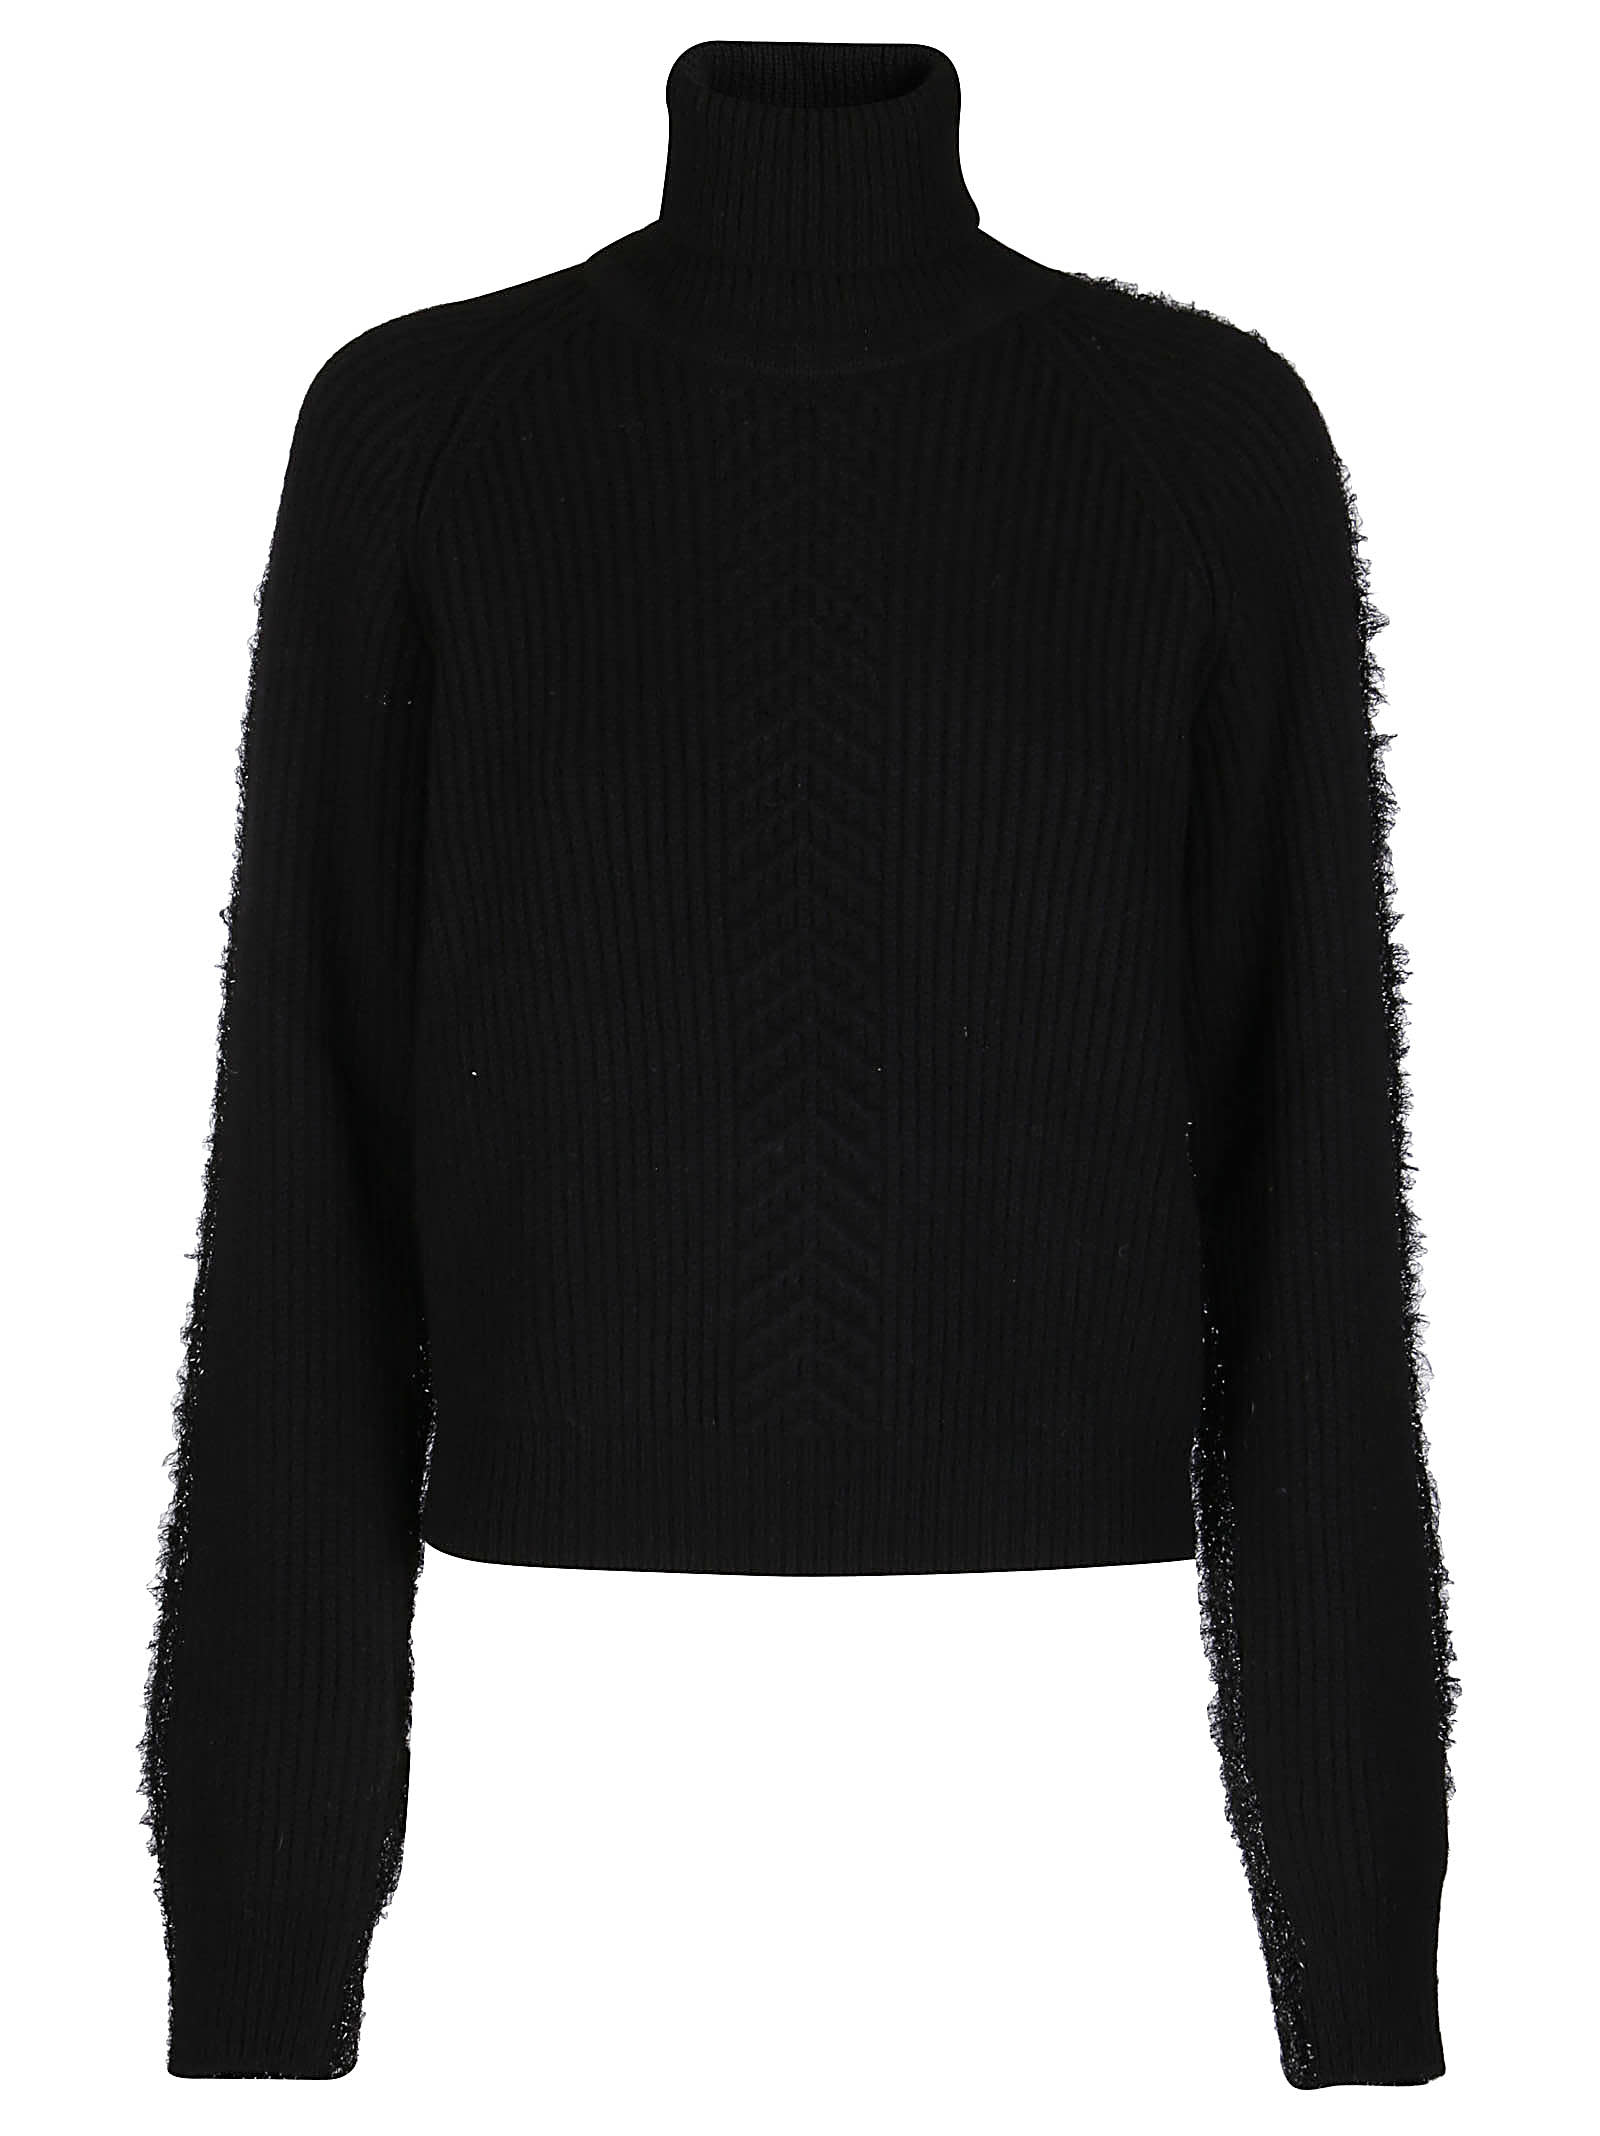 Maison Margiela Black Wool Jumper